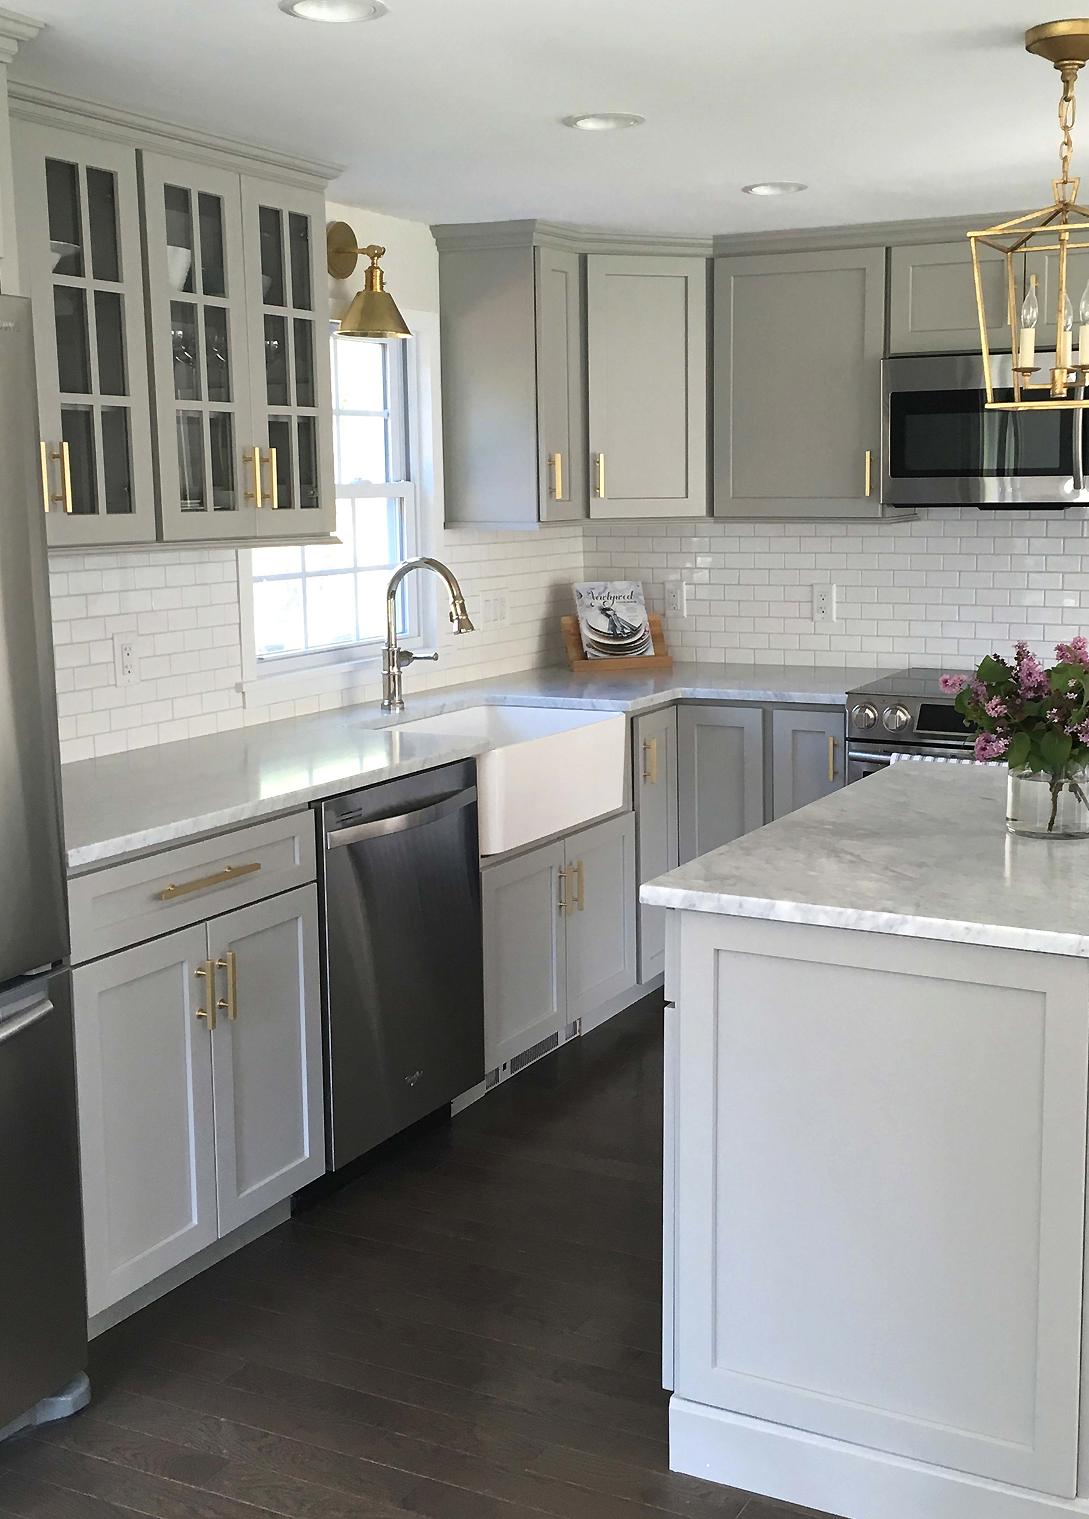 We Love This Stylish Gray Kitchen With Goldhardware Kitchen